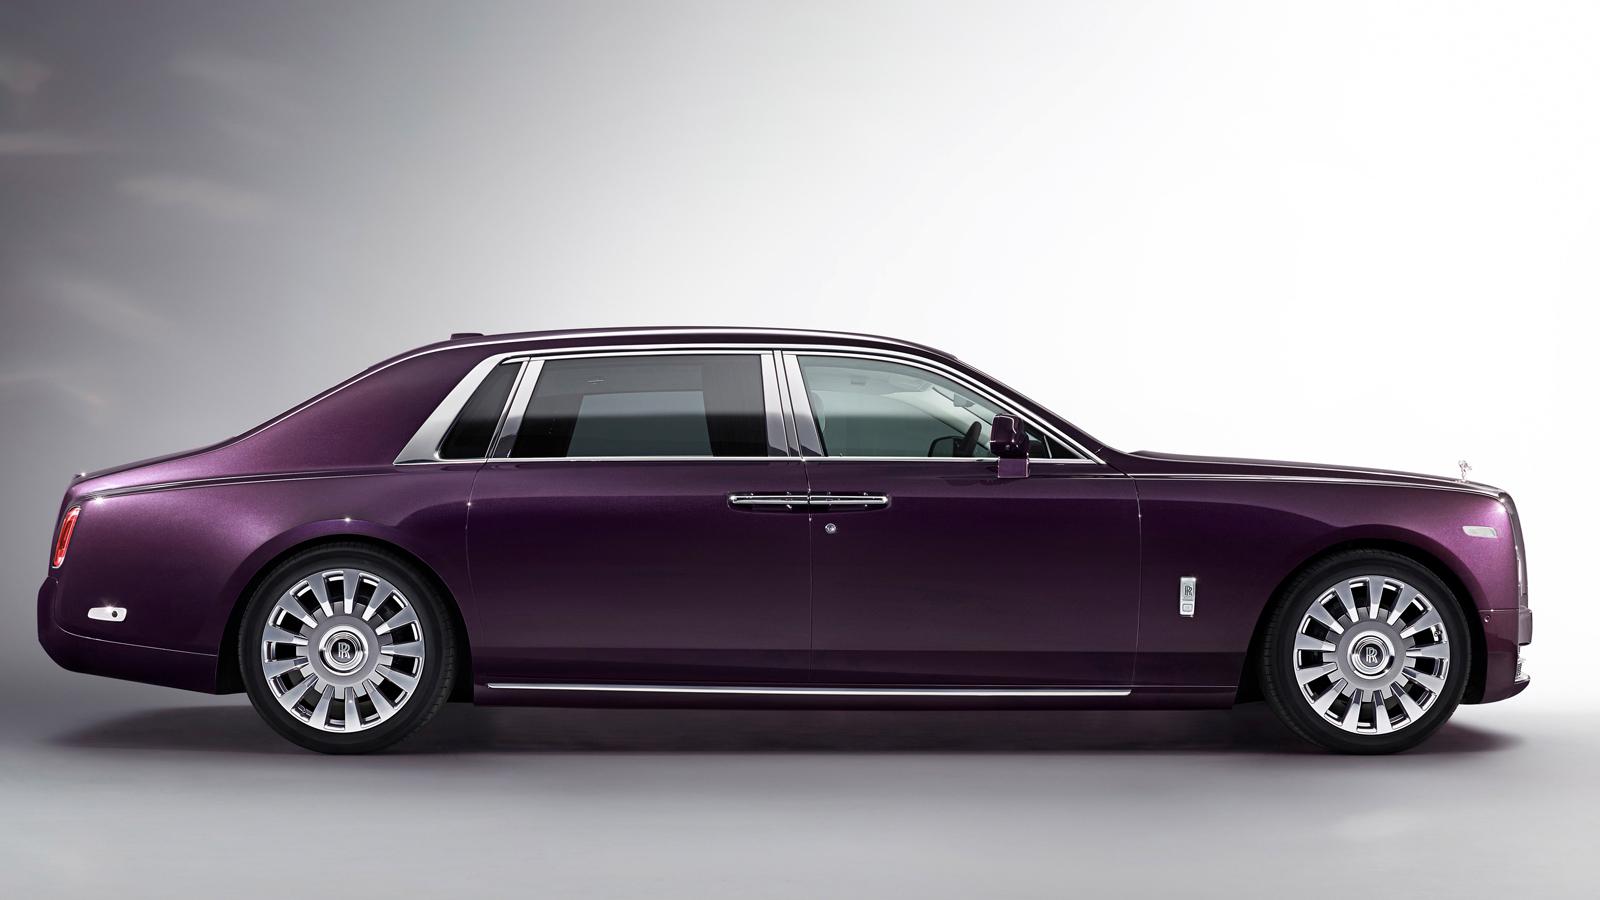 rolls-royce-phantom-rental-miami-beach-luxury-exotic-car-rental